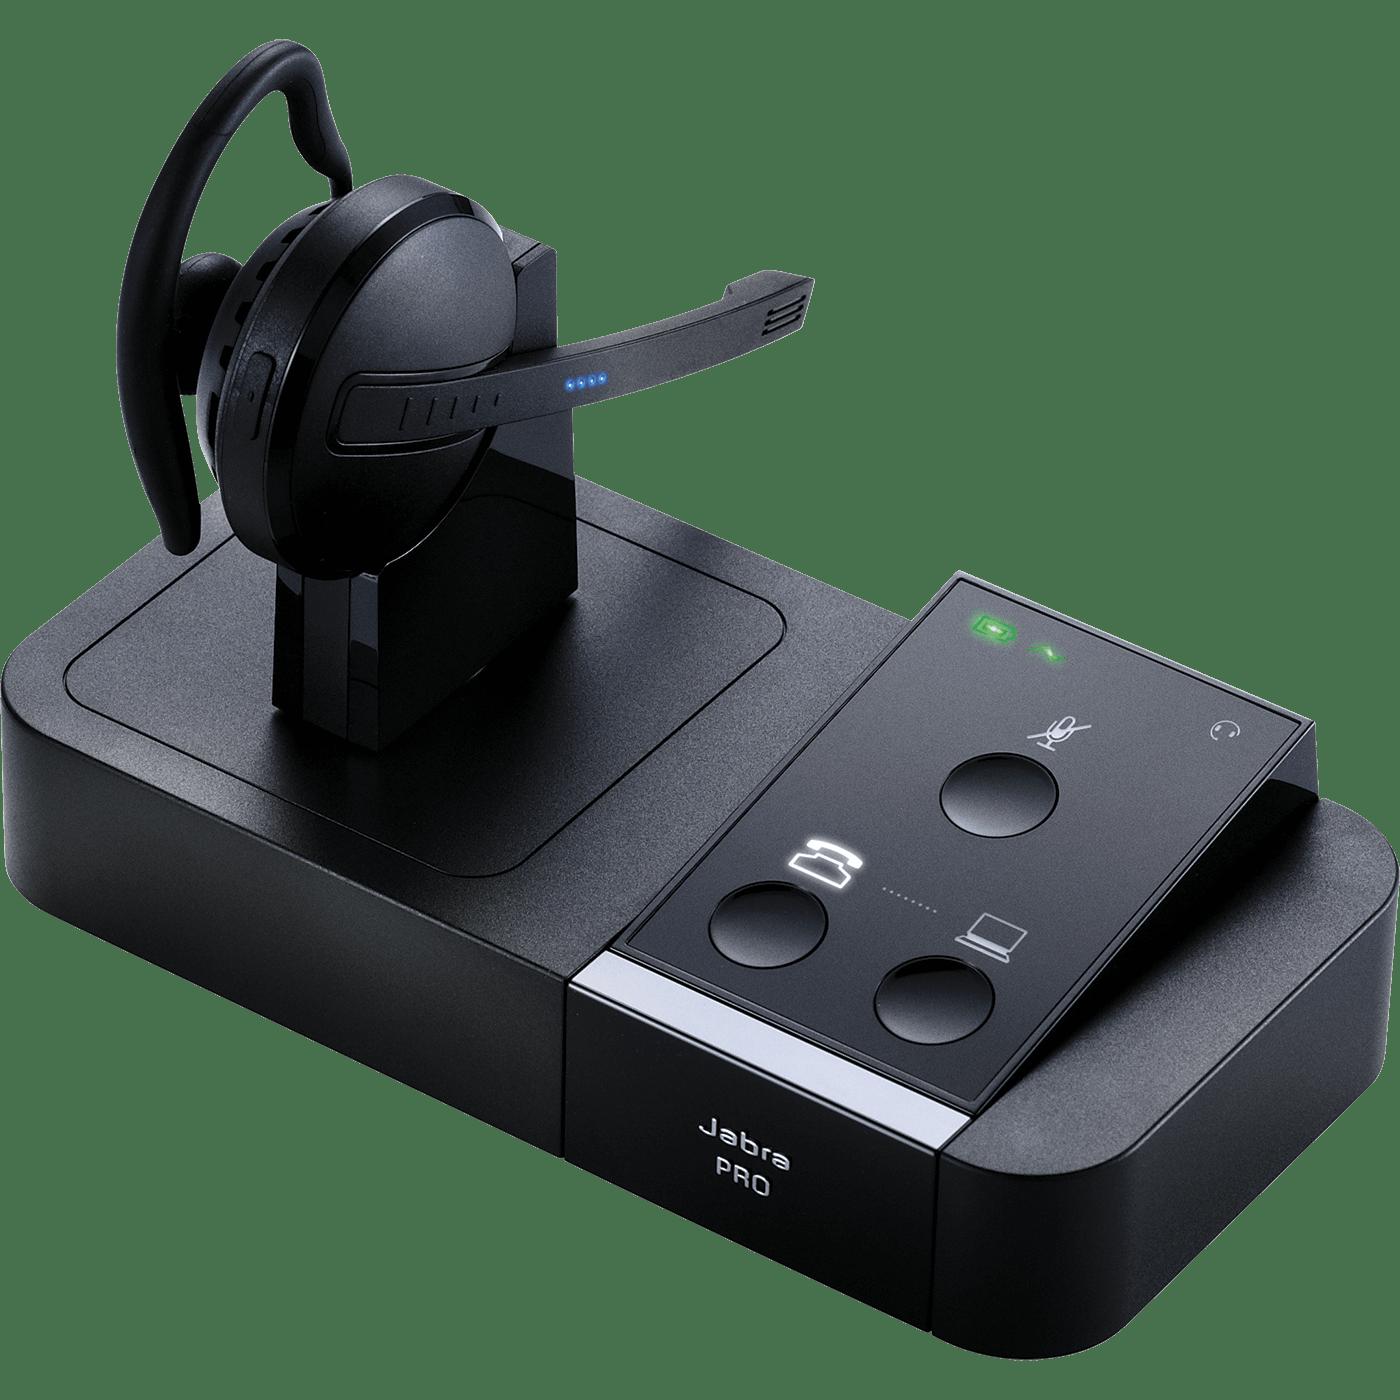 Jabra PRO 9450 Flex Headset 9450-65-507-105 Convertible DECT 6.0 Wireless